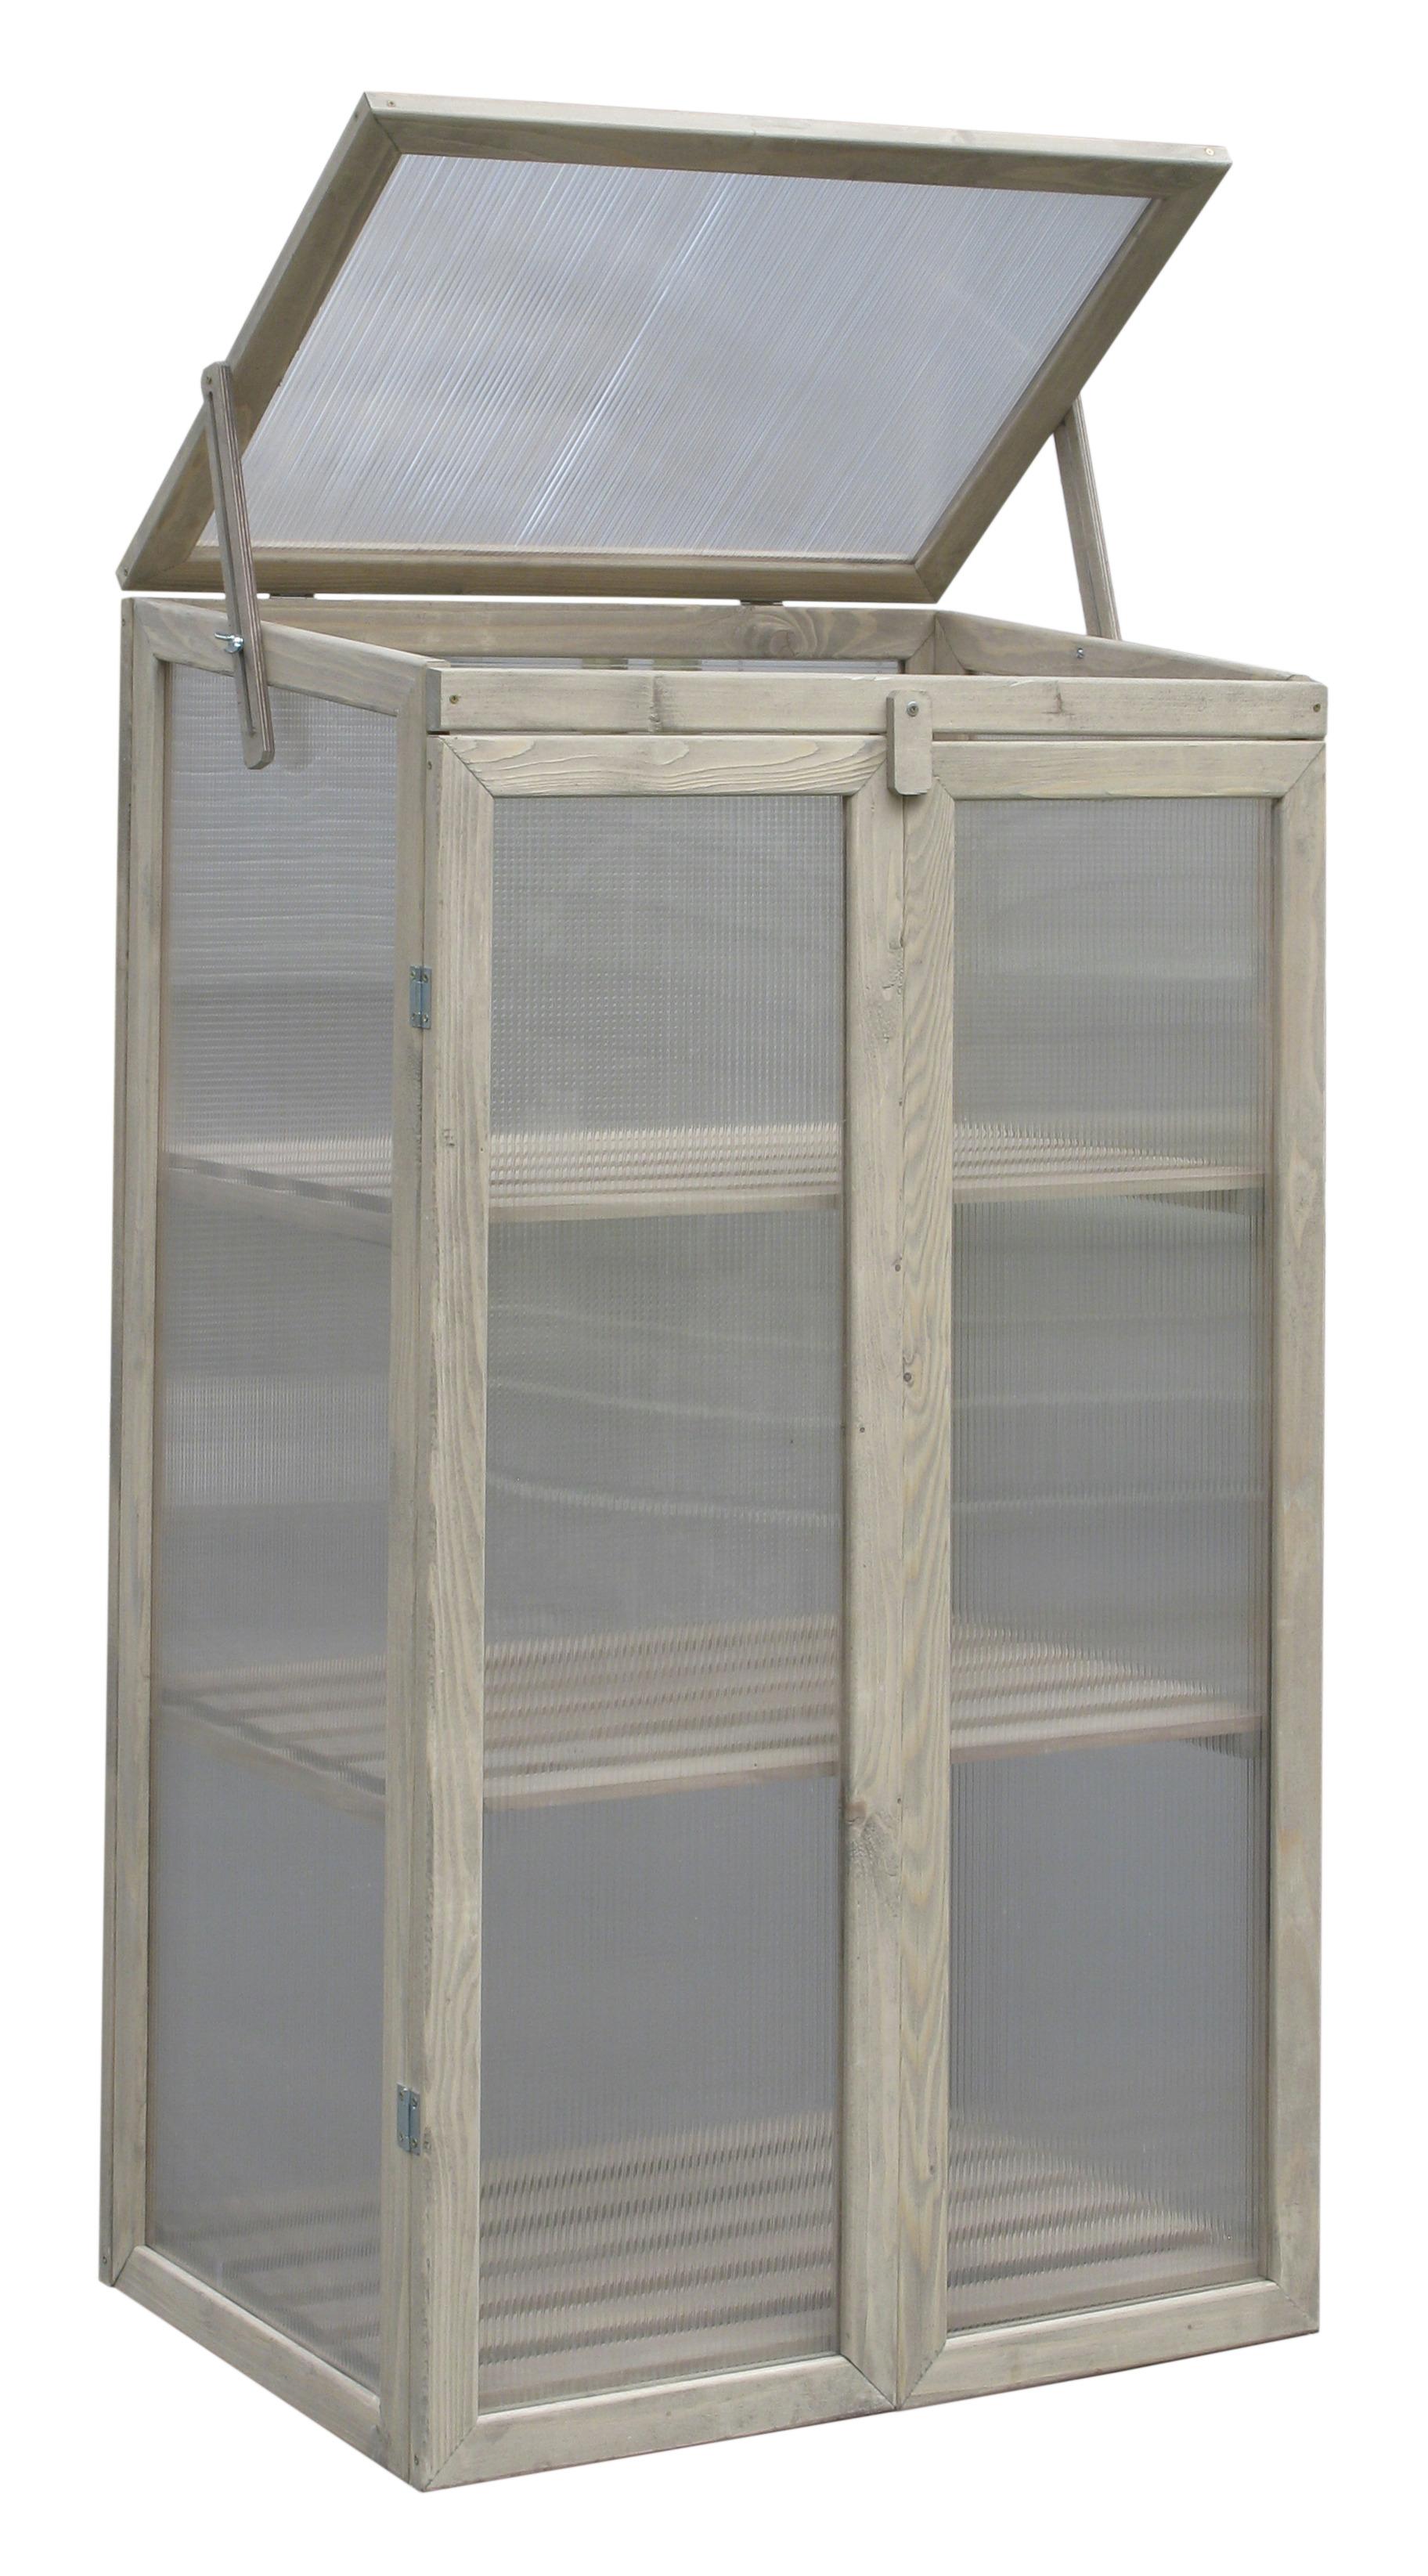 Kweekkastje met deuren h120 cm